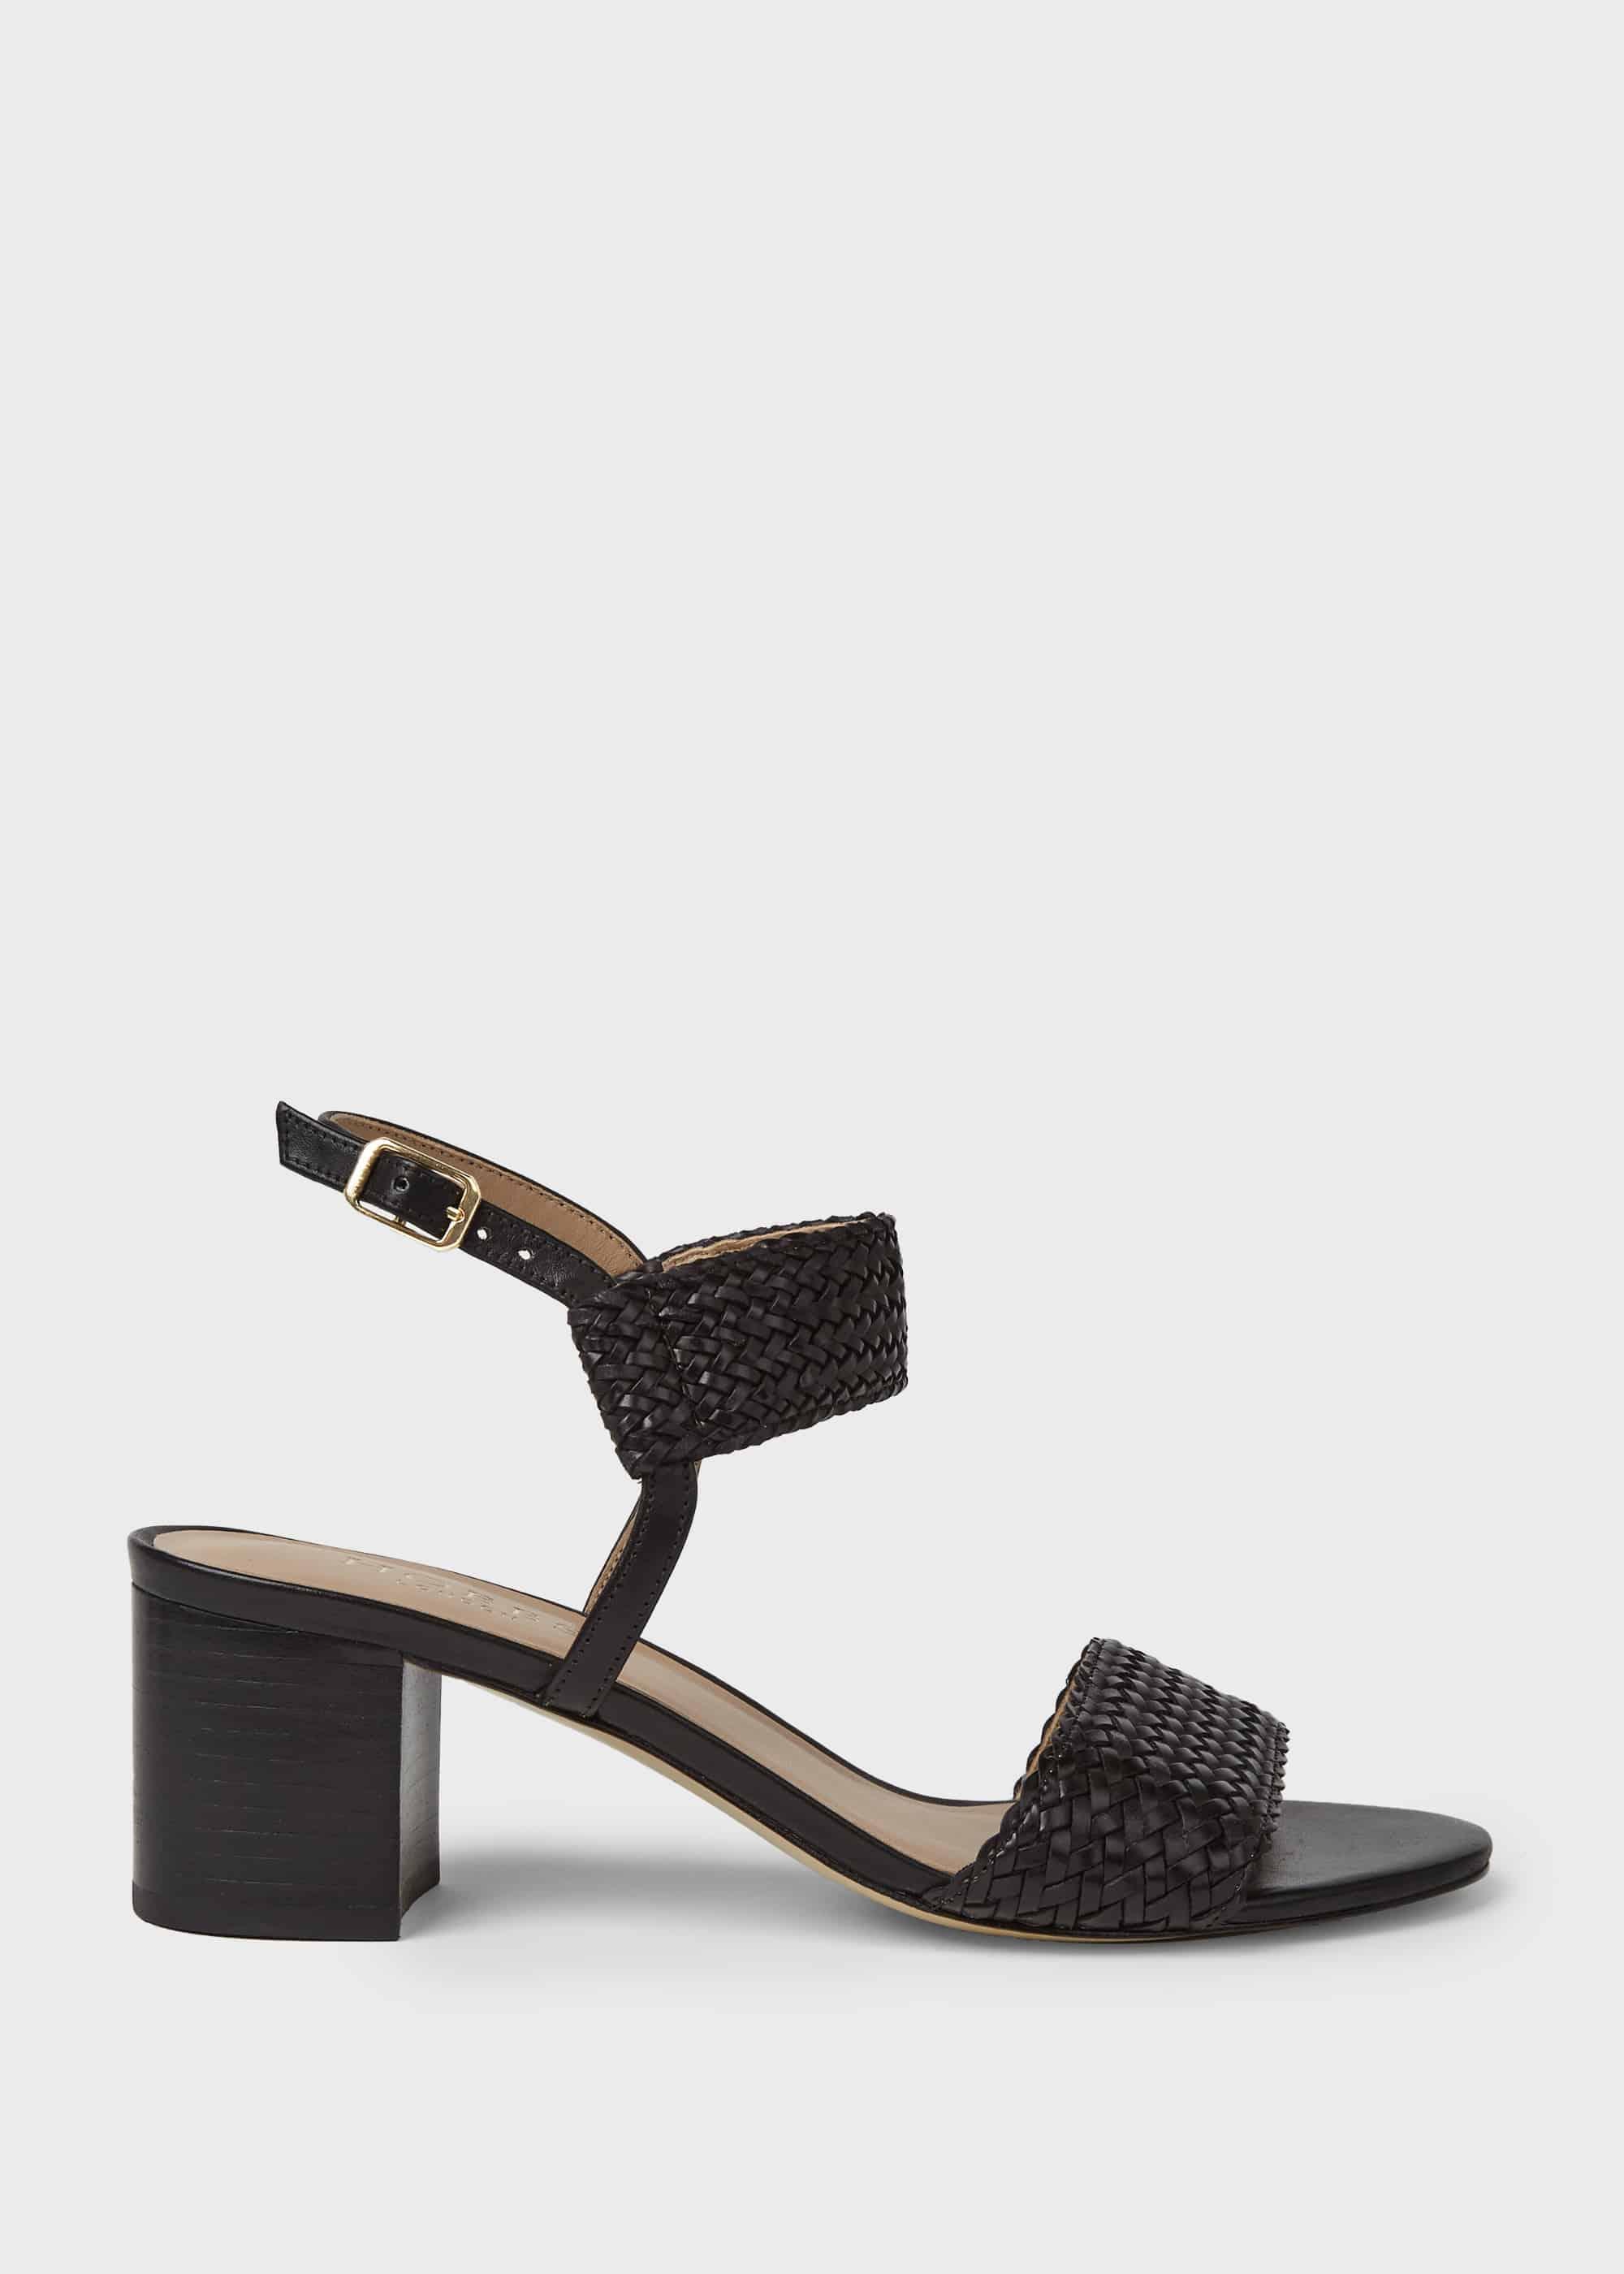 Hobbs Women Lois Leather Sandals